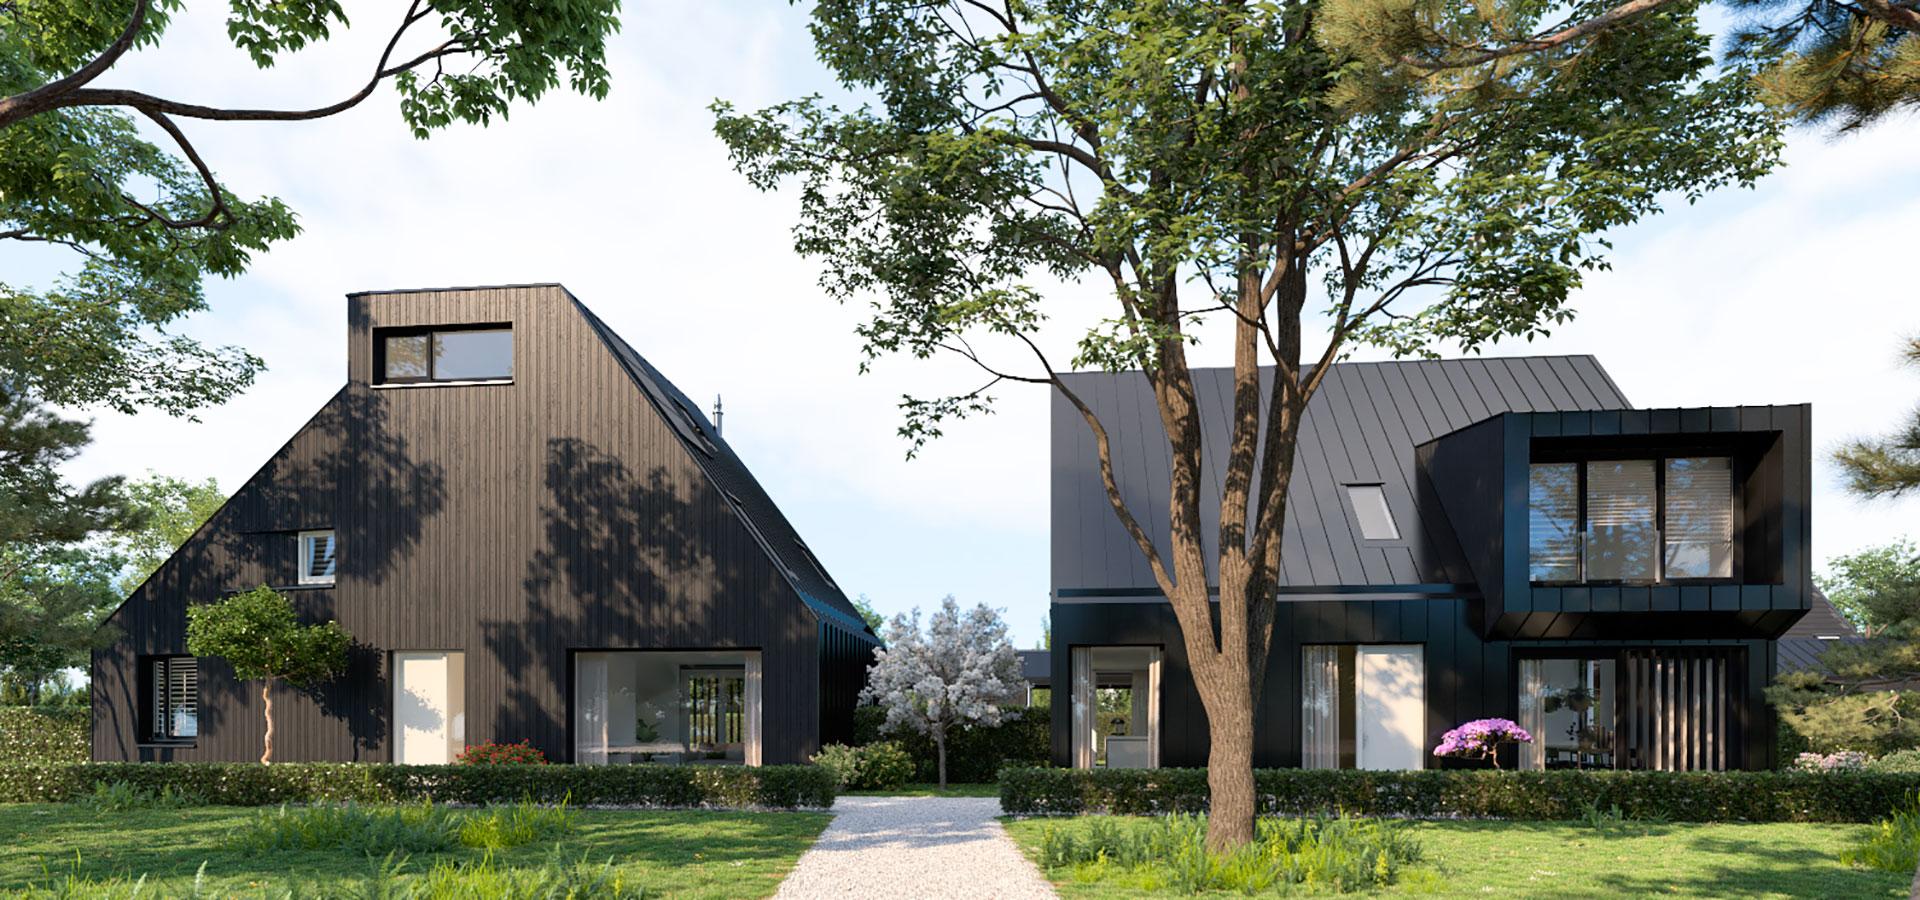 ARO architecten Winkelbuurt Abcoude 07